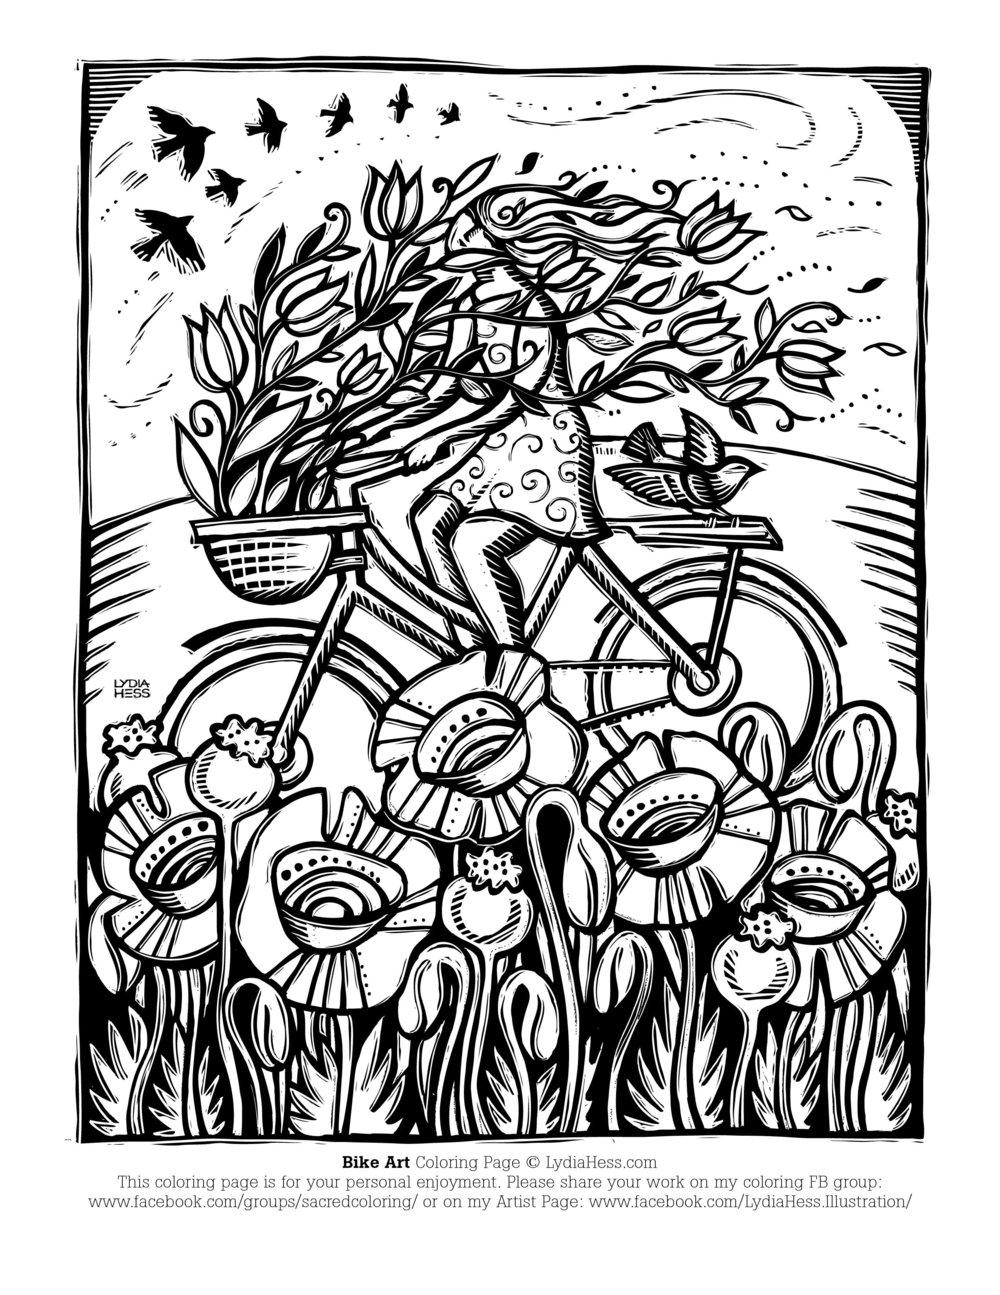 BikeArt-Lydiahess.jpg